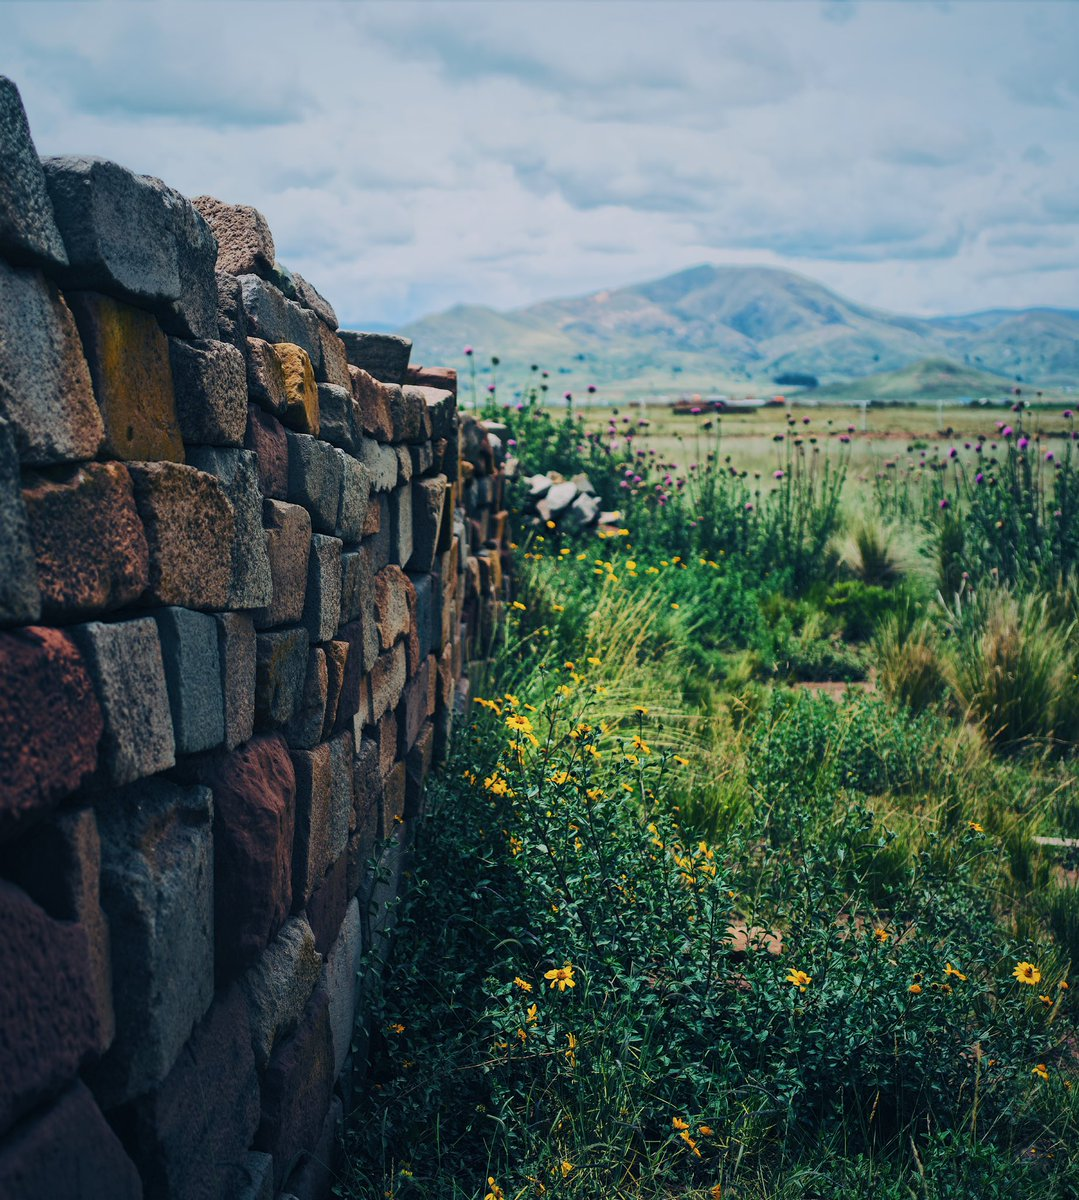 Choque entre la naturaleza y el paso de la humanidad! Crash between nature and the passage of humanity! #tiwanaku  #naturephoto  #naturephotography  @vsco  🌸 ------- #vsco #sony #sonyalpha #bealpha #sonyphotography #sonyphoto #photography #fotografia #photo #foto #southamerica